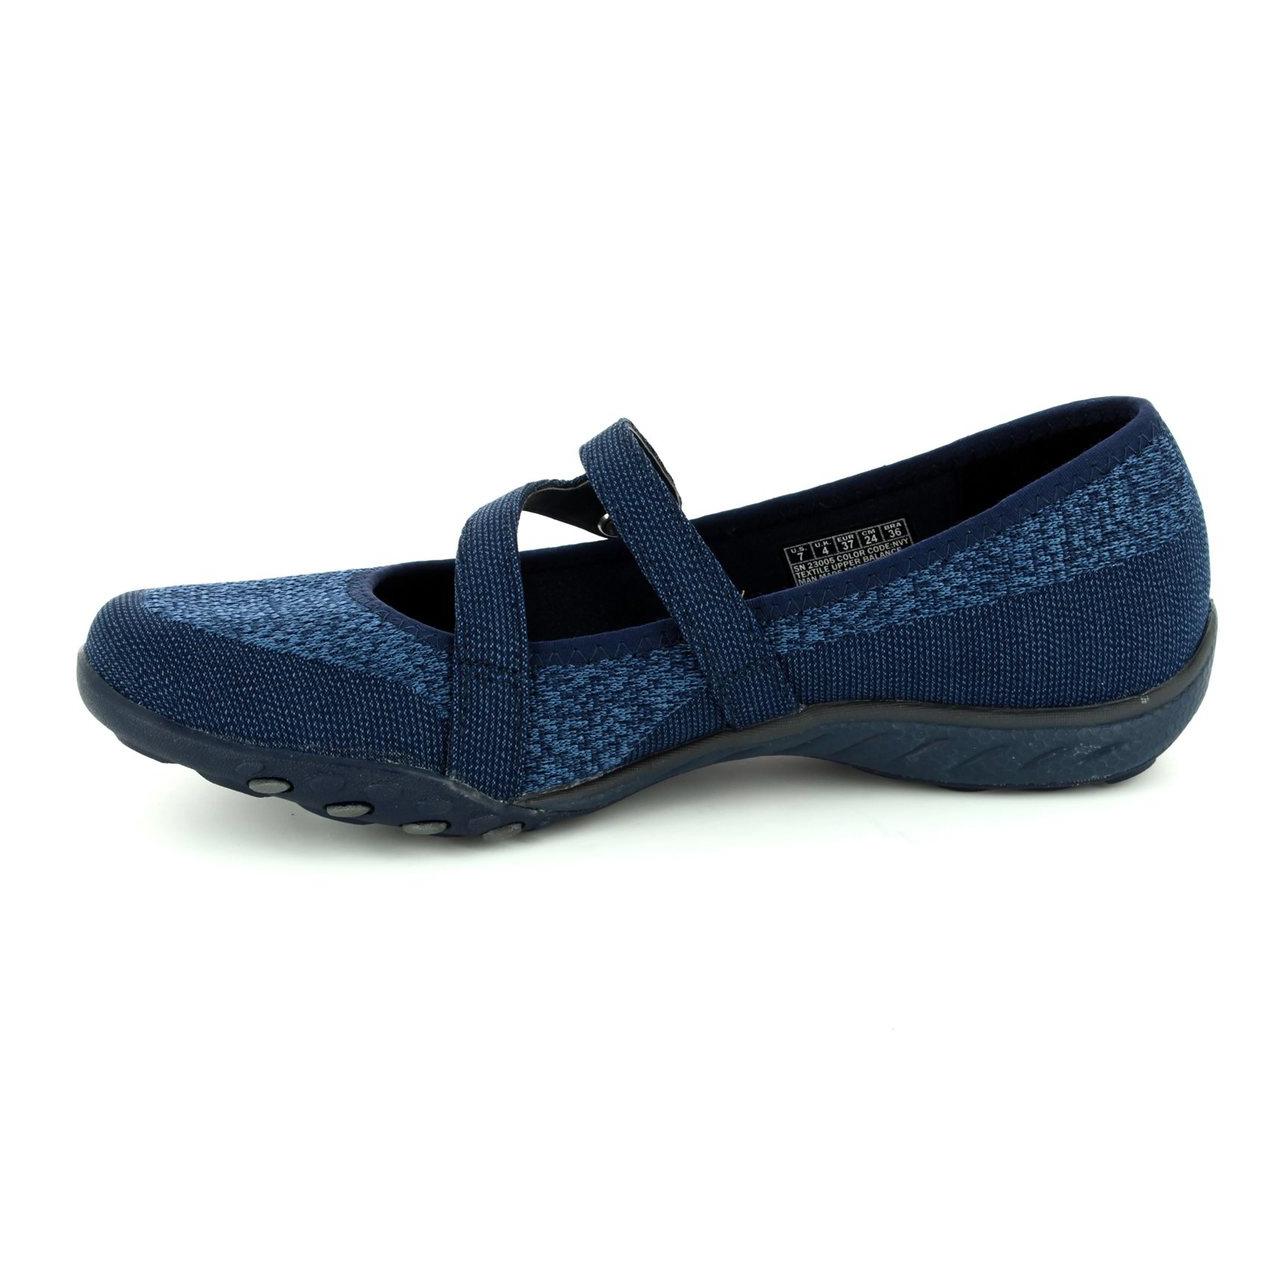 کفش مخصوص پیاده روی زنانه اسکچرز مدل MIRACLE 23005 NVY